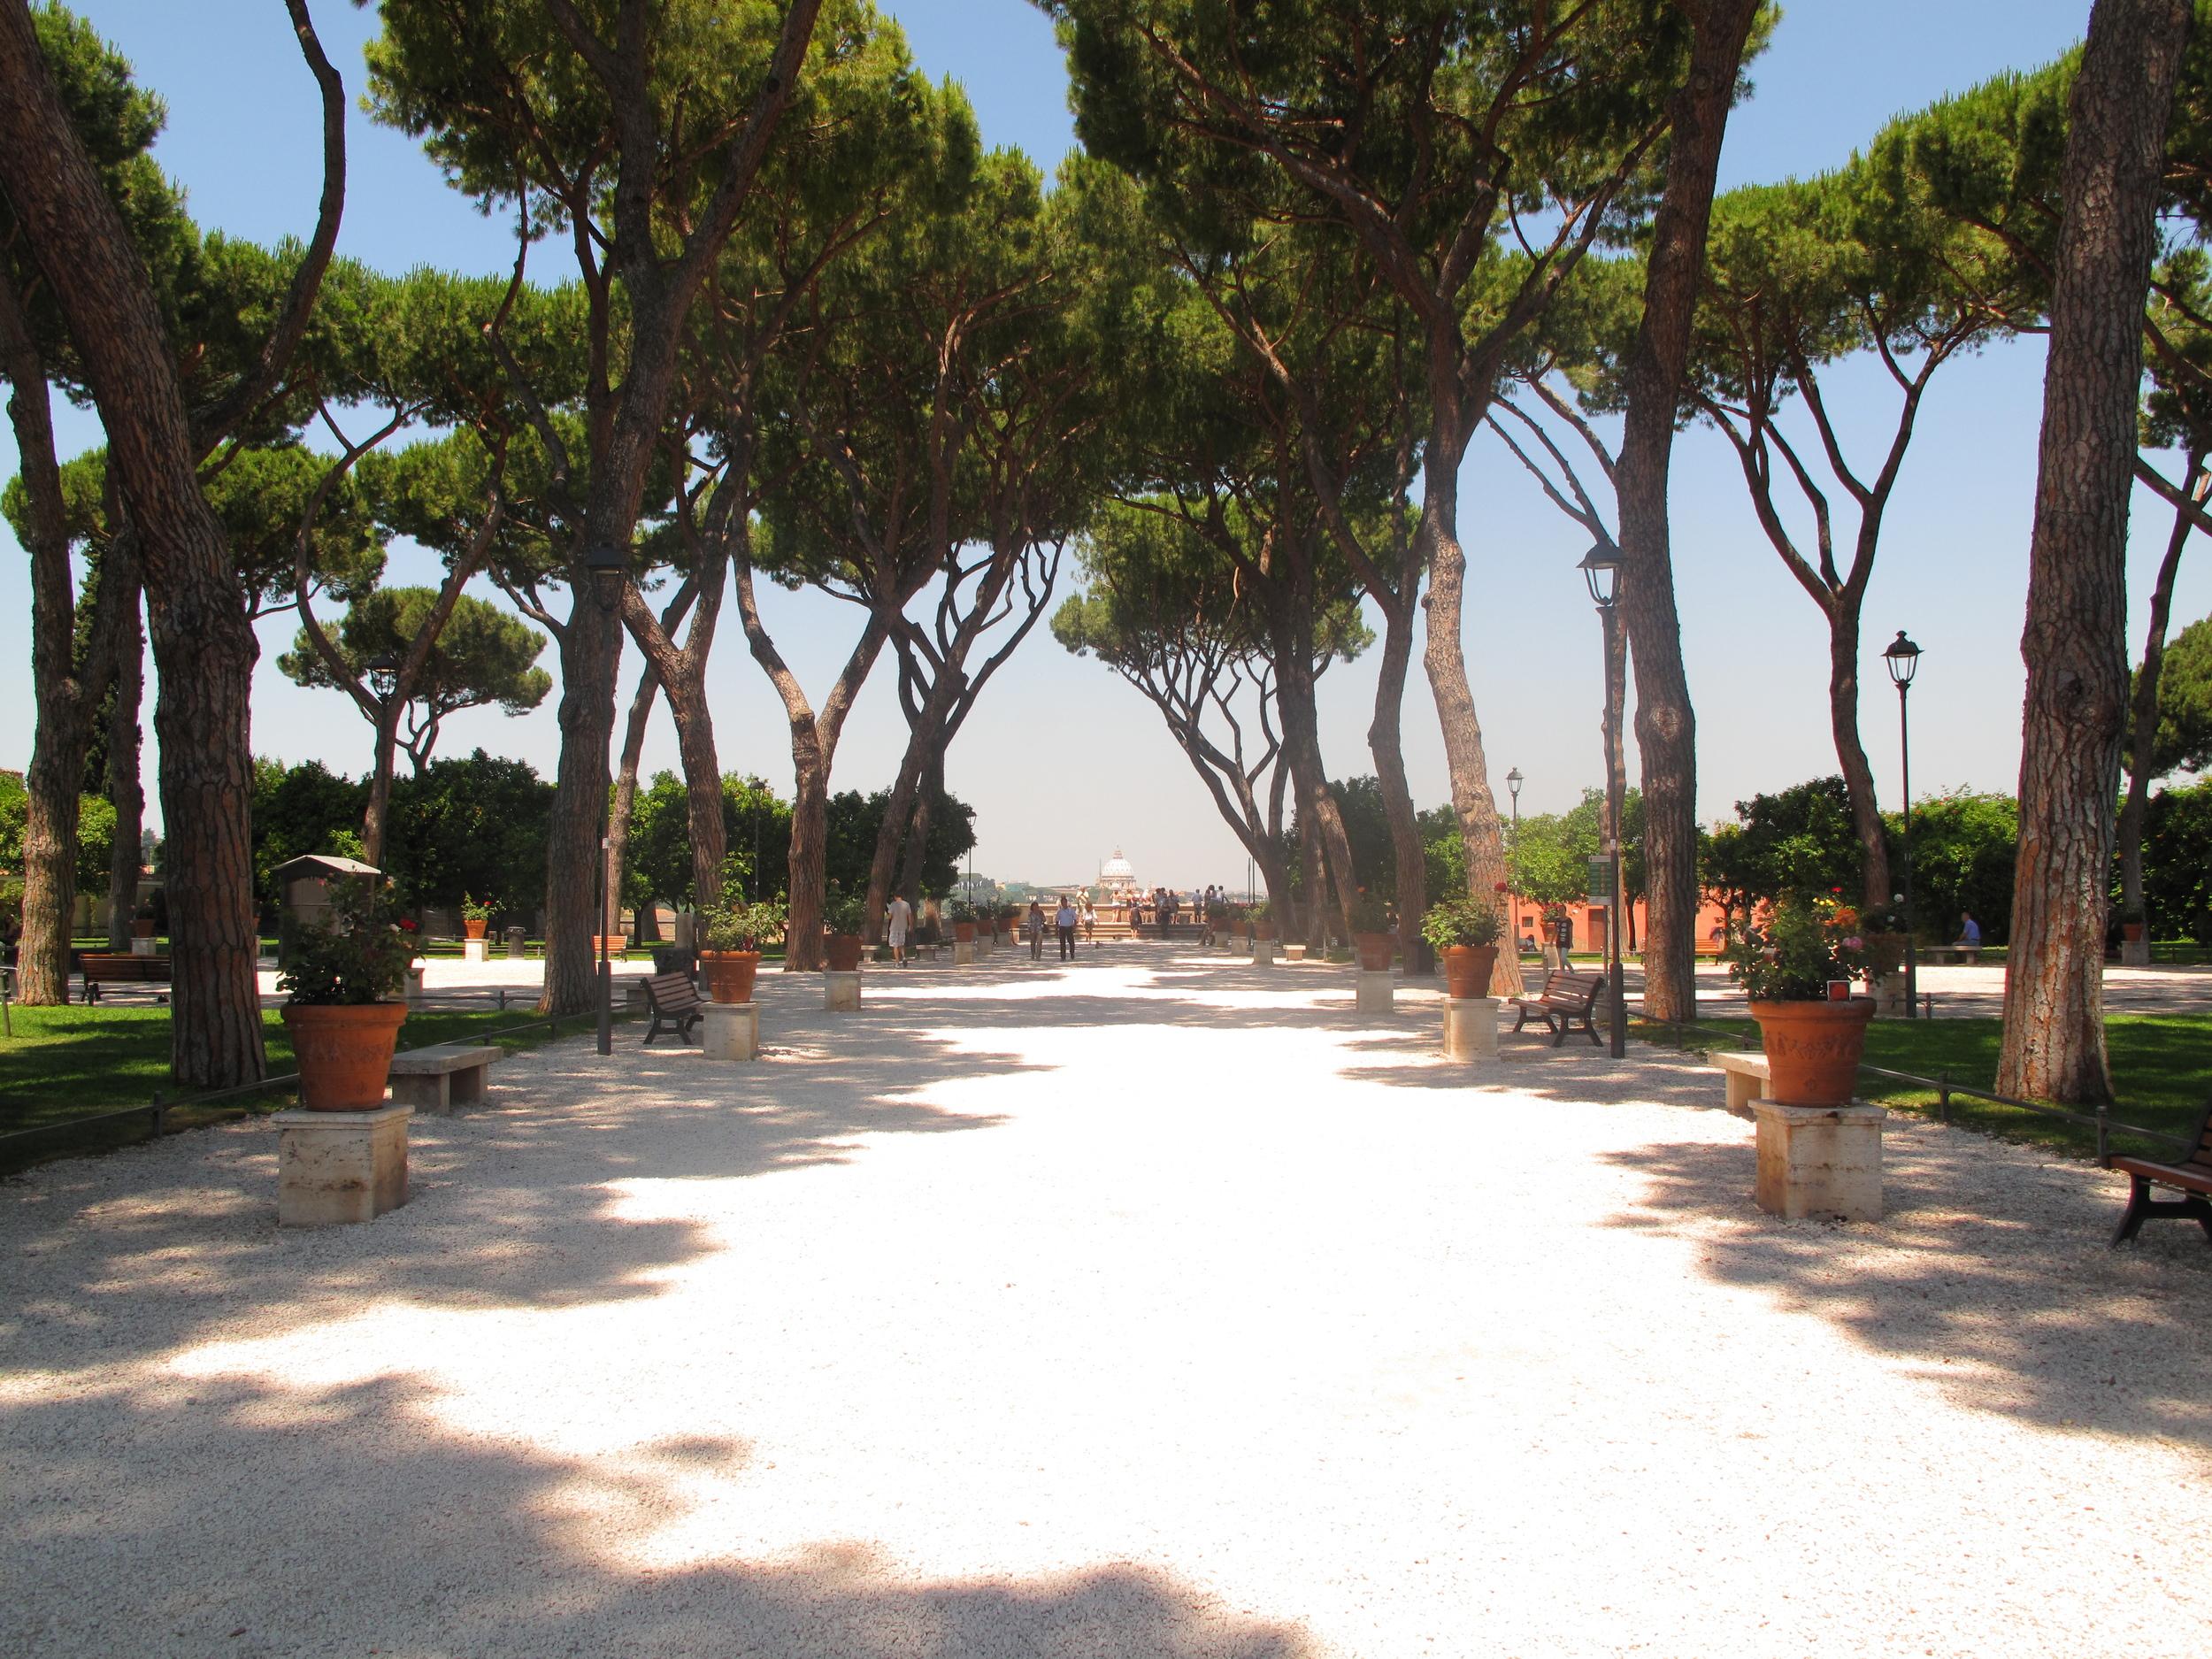 The Giardino degli Aranci, Orange Garden, Rome